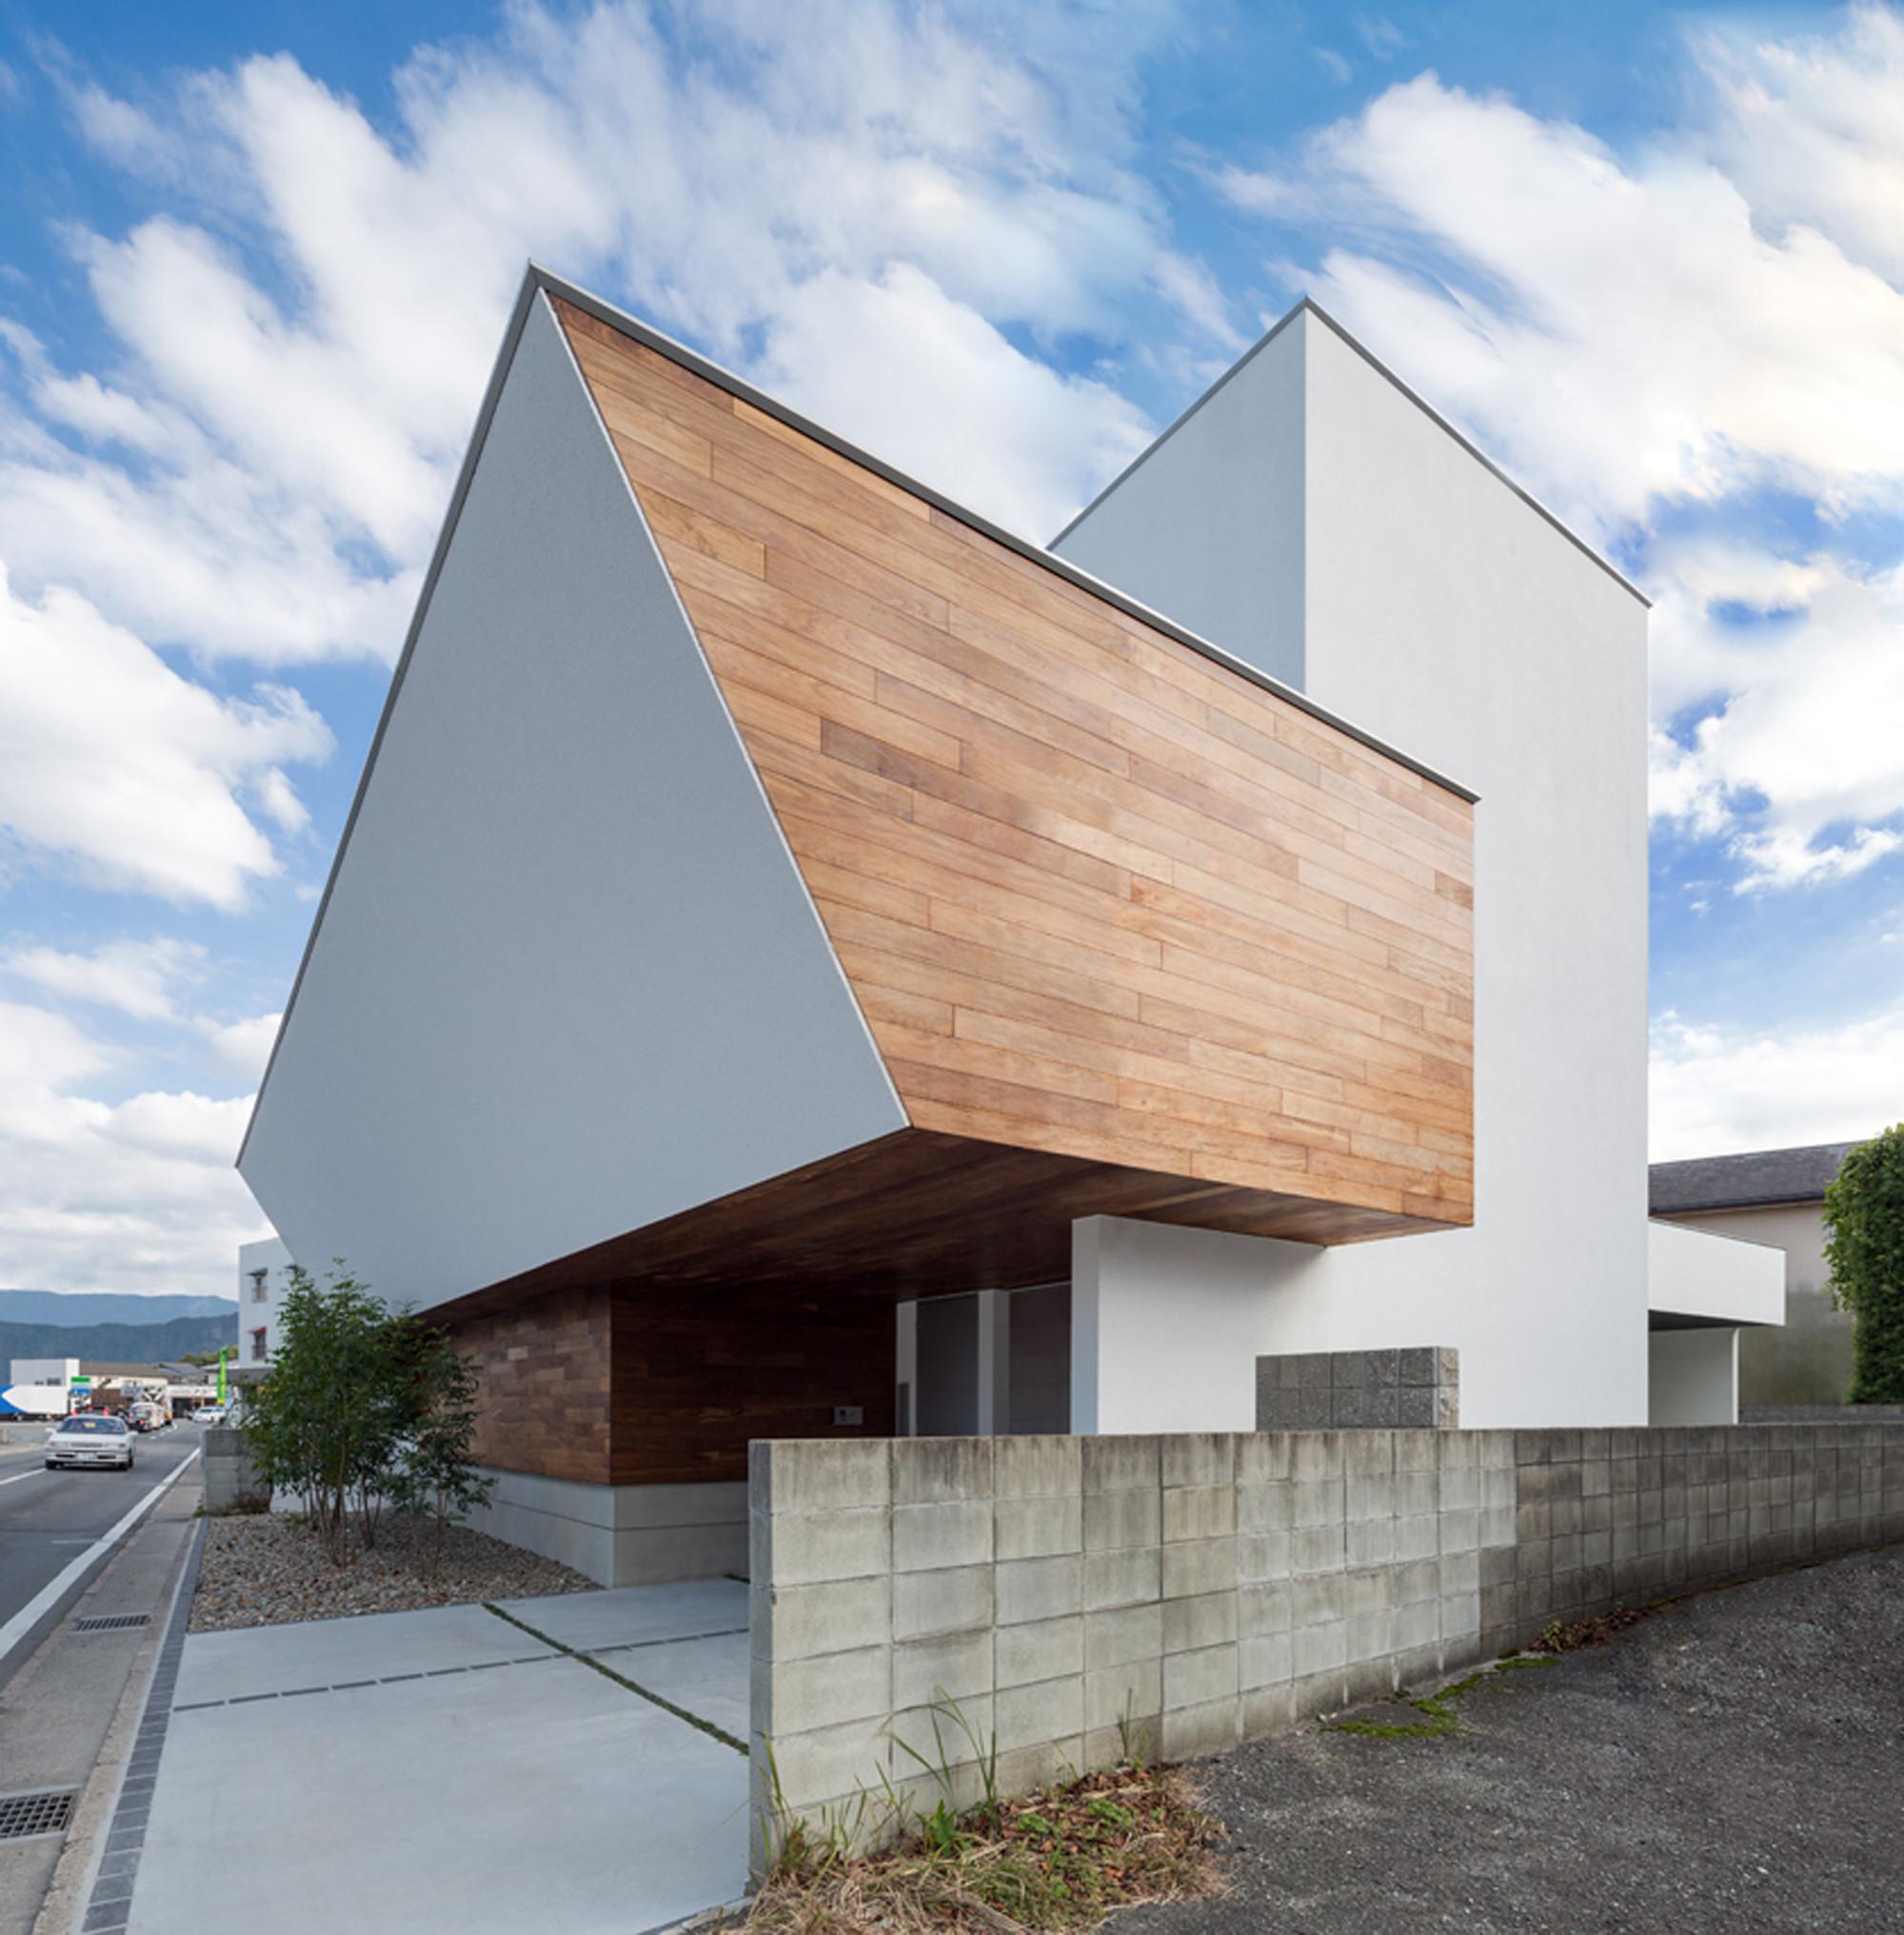 Casa A-2 / Architect Show, © Toshihisa Ishii